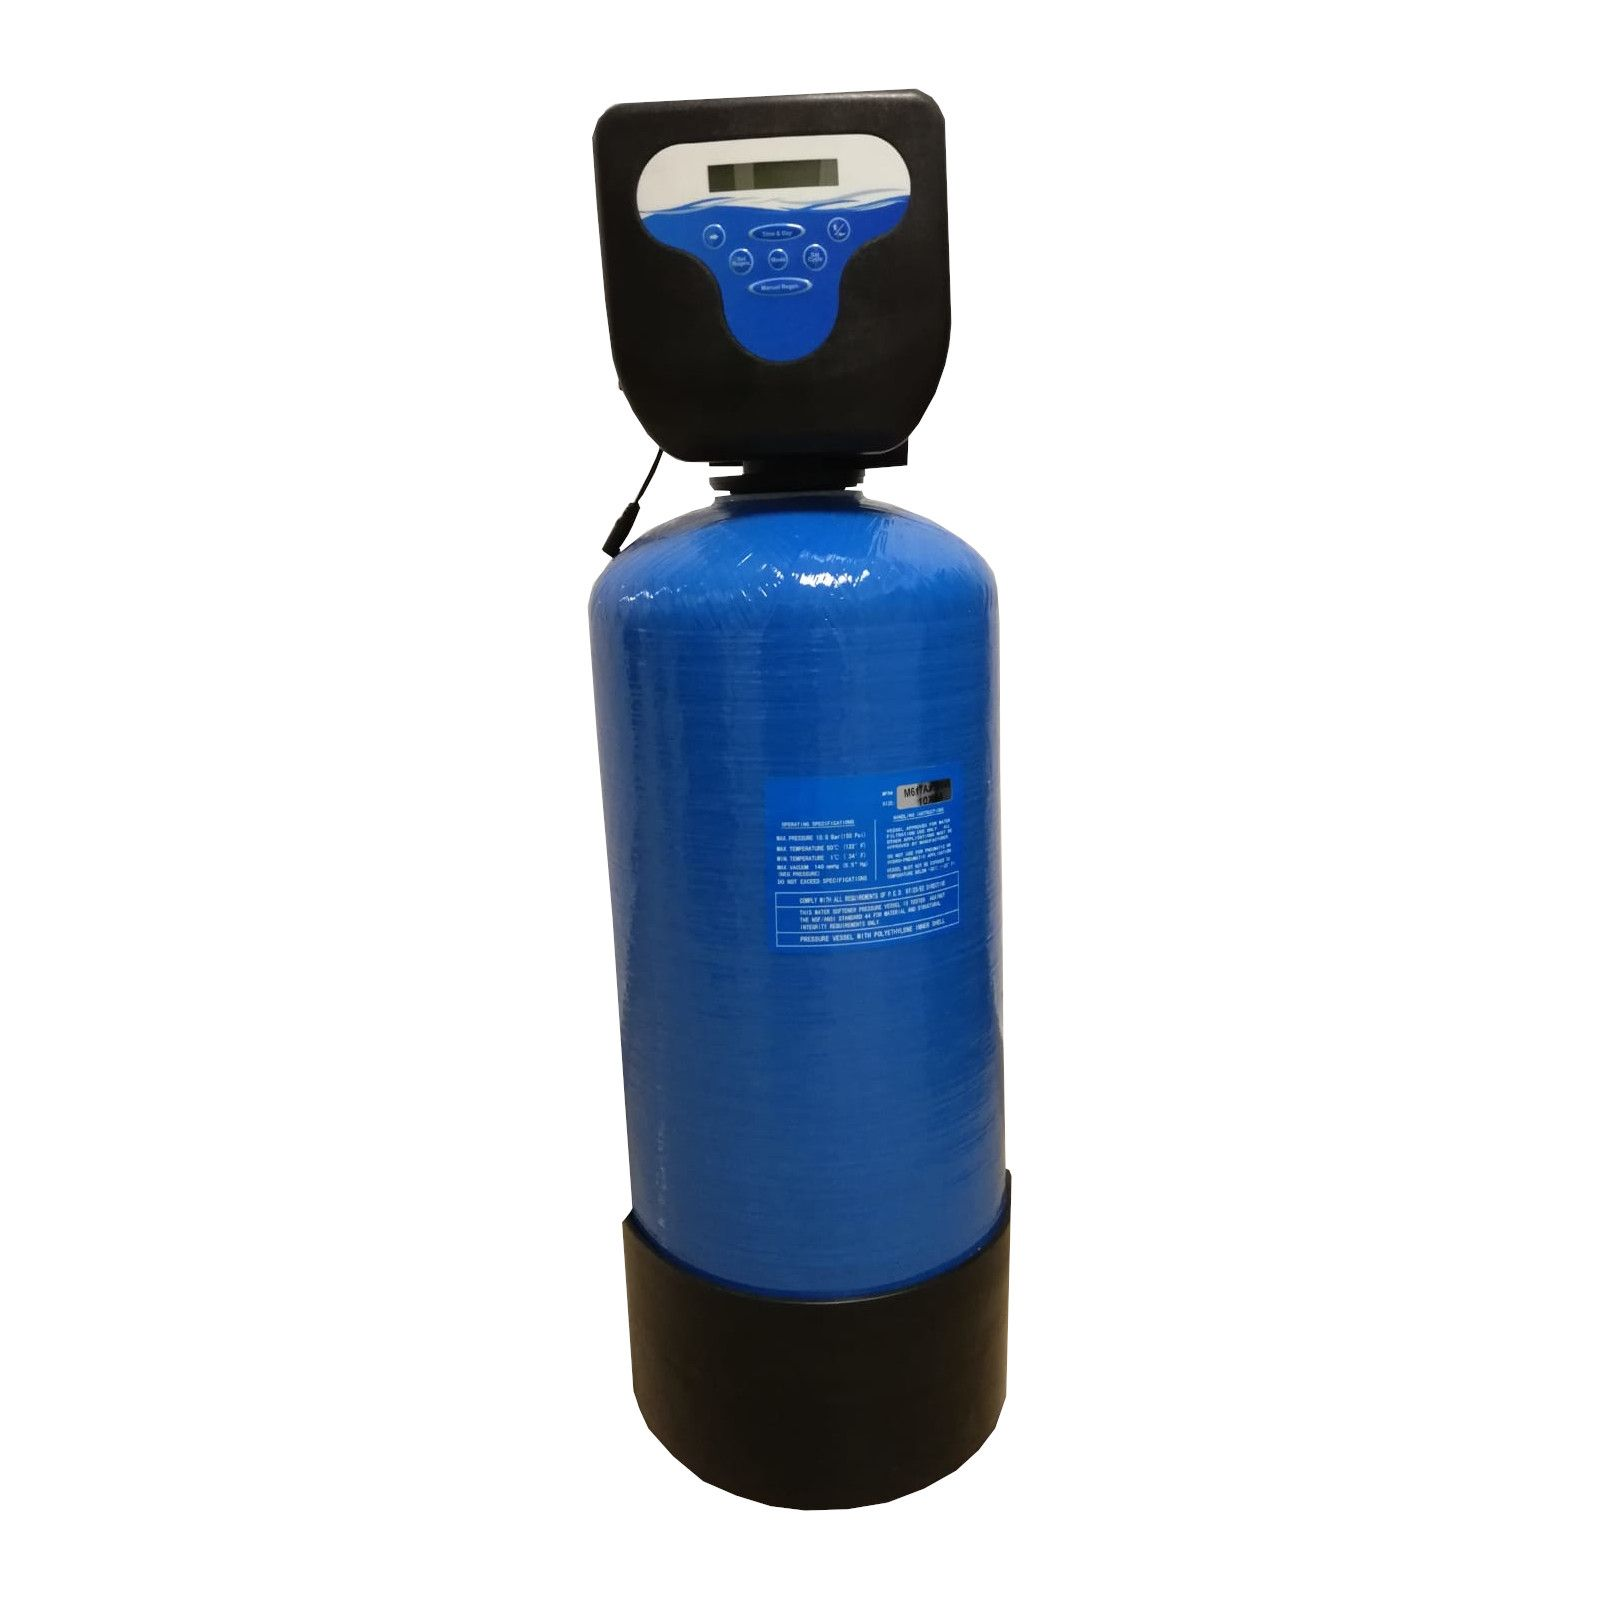 Filtru apa automat cu zeolit Aqua DM 15, Debit 1.35 mc/h, Capacitate filtrare 25.000 litri, Cartus din Rasina  - AquaFilters.ro